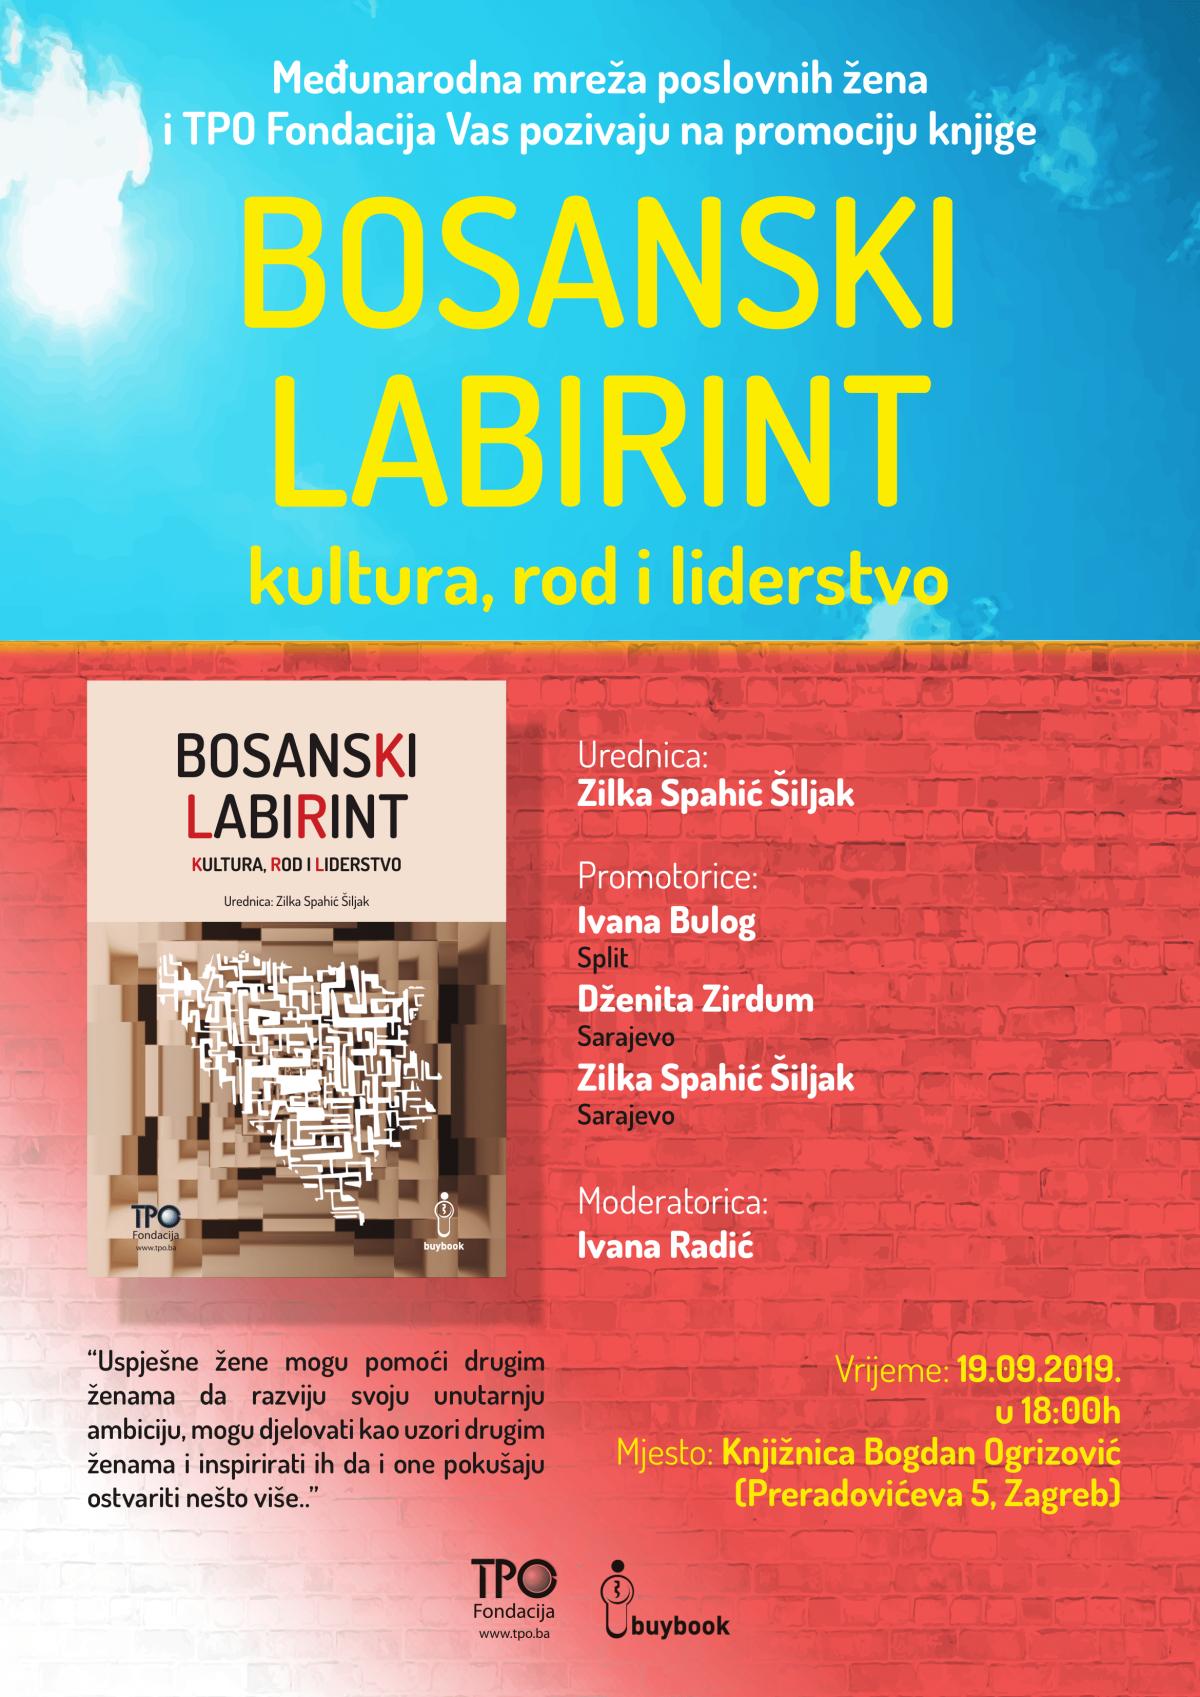 Bosanski labirint plakat A3 Zagreb